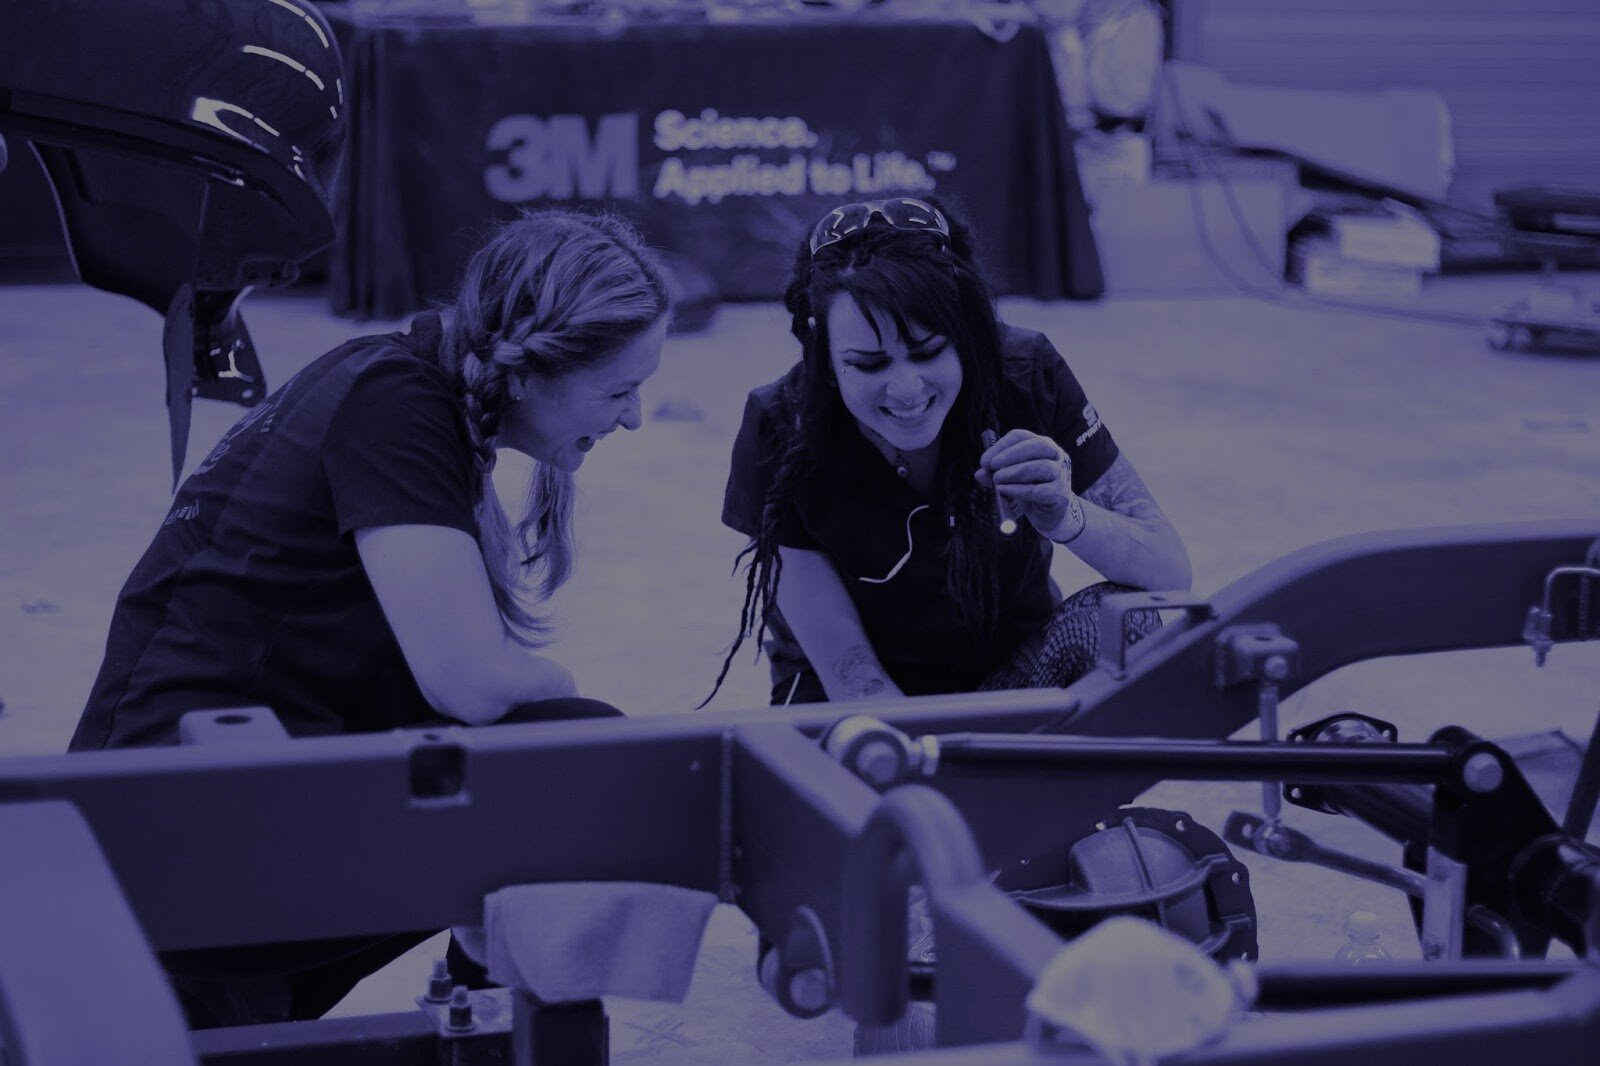 Hands-On Automotive Classes for Women -